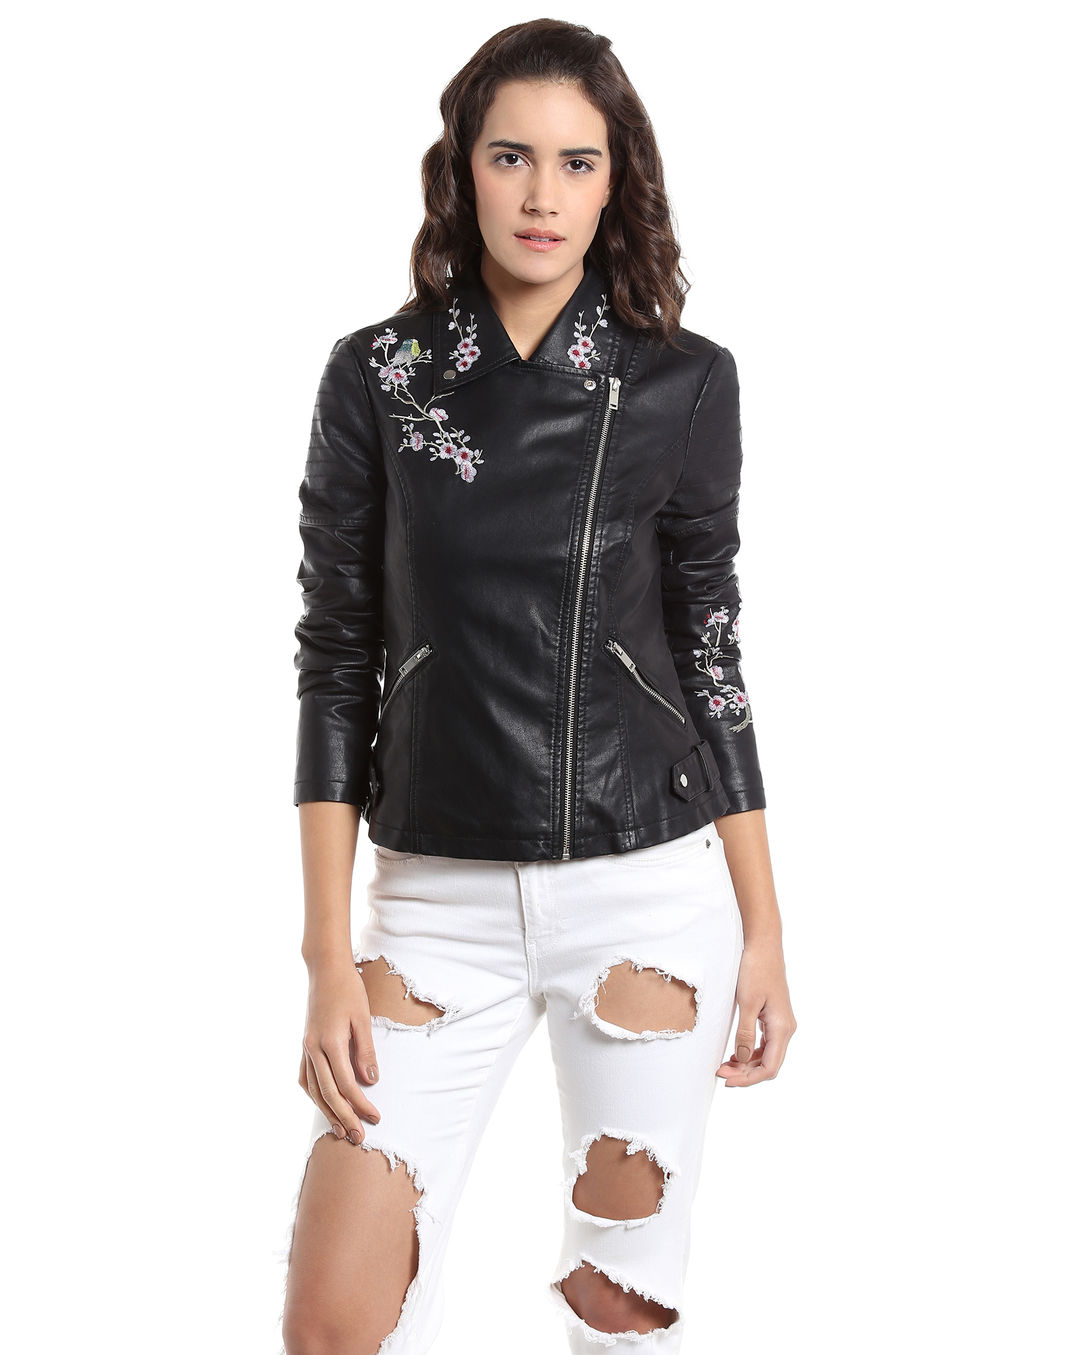 7dc9d1de6 Buy Vero Moda Black Embroidered Cropped Biker Jacket Online   Vero Moda